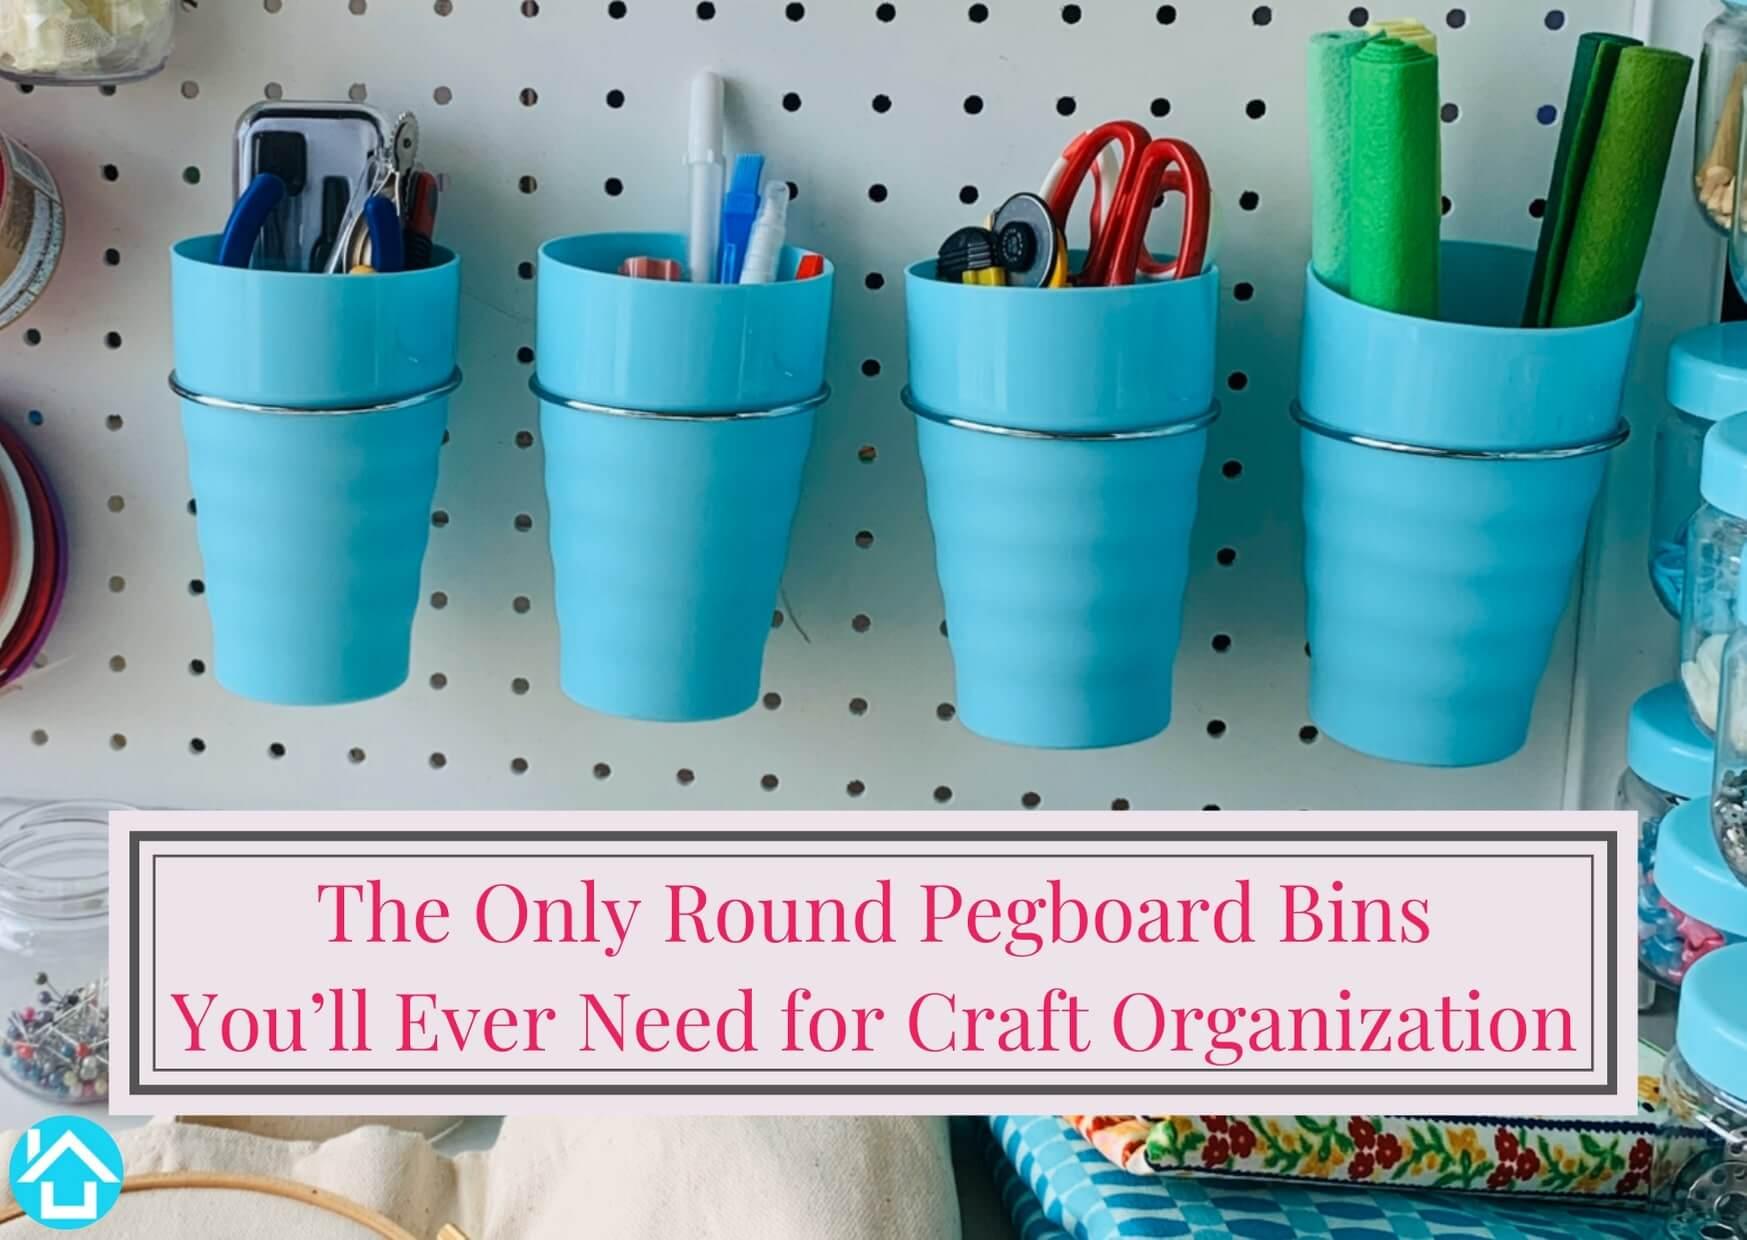 Round Pegboard Bins